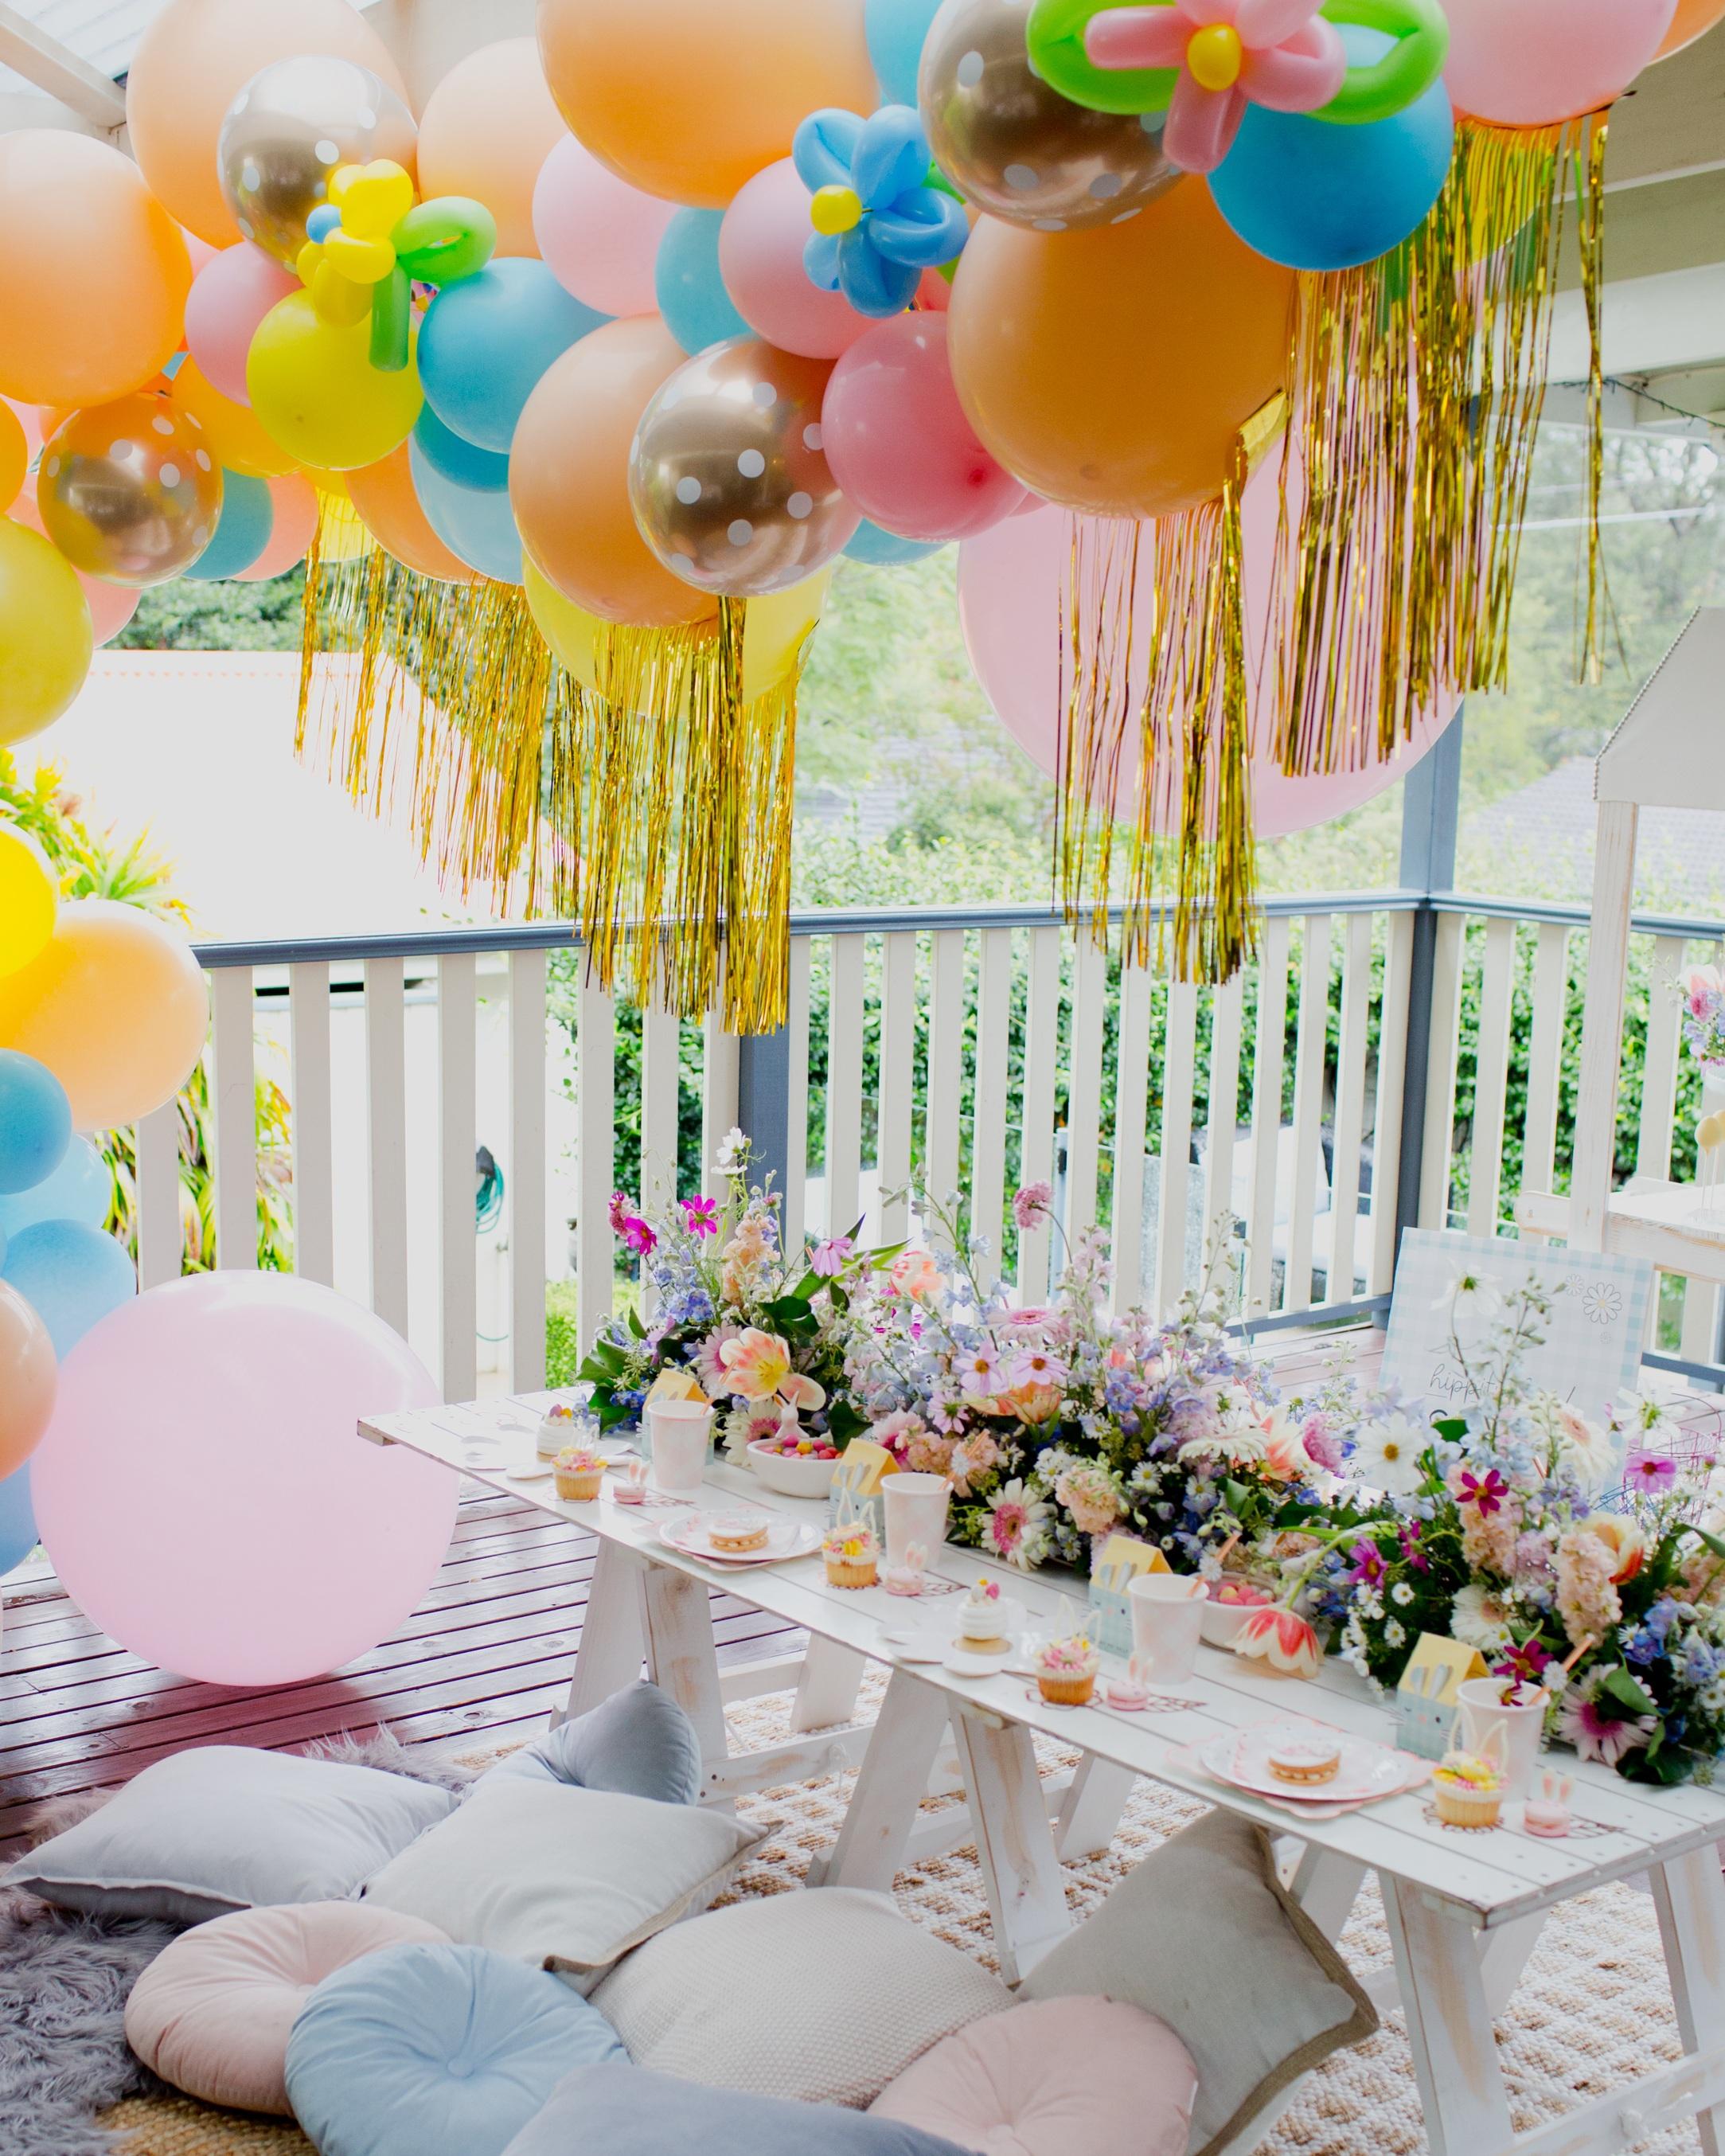 celebrations-private-party-dinner-sydney-florist